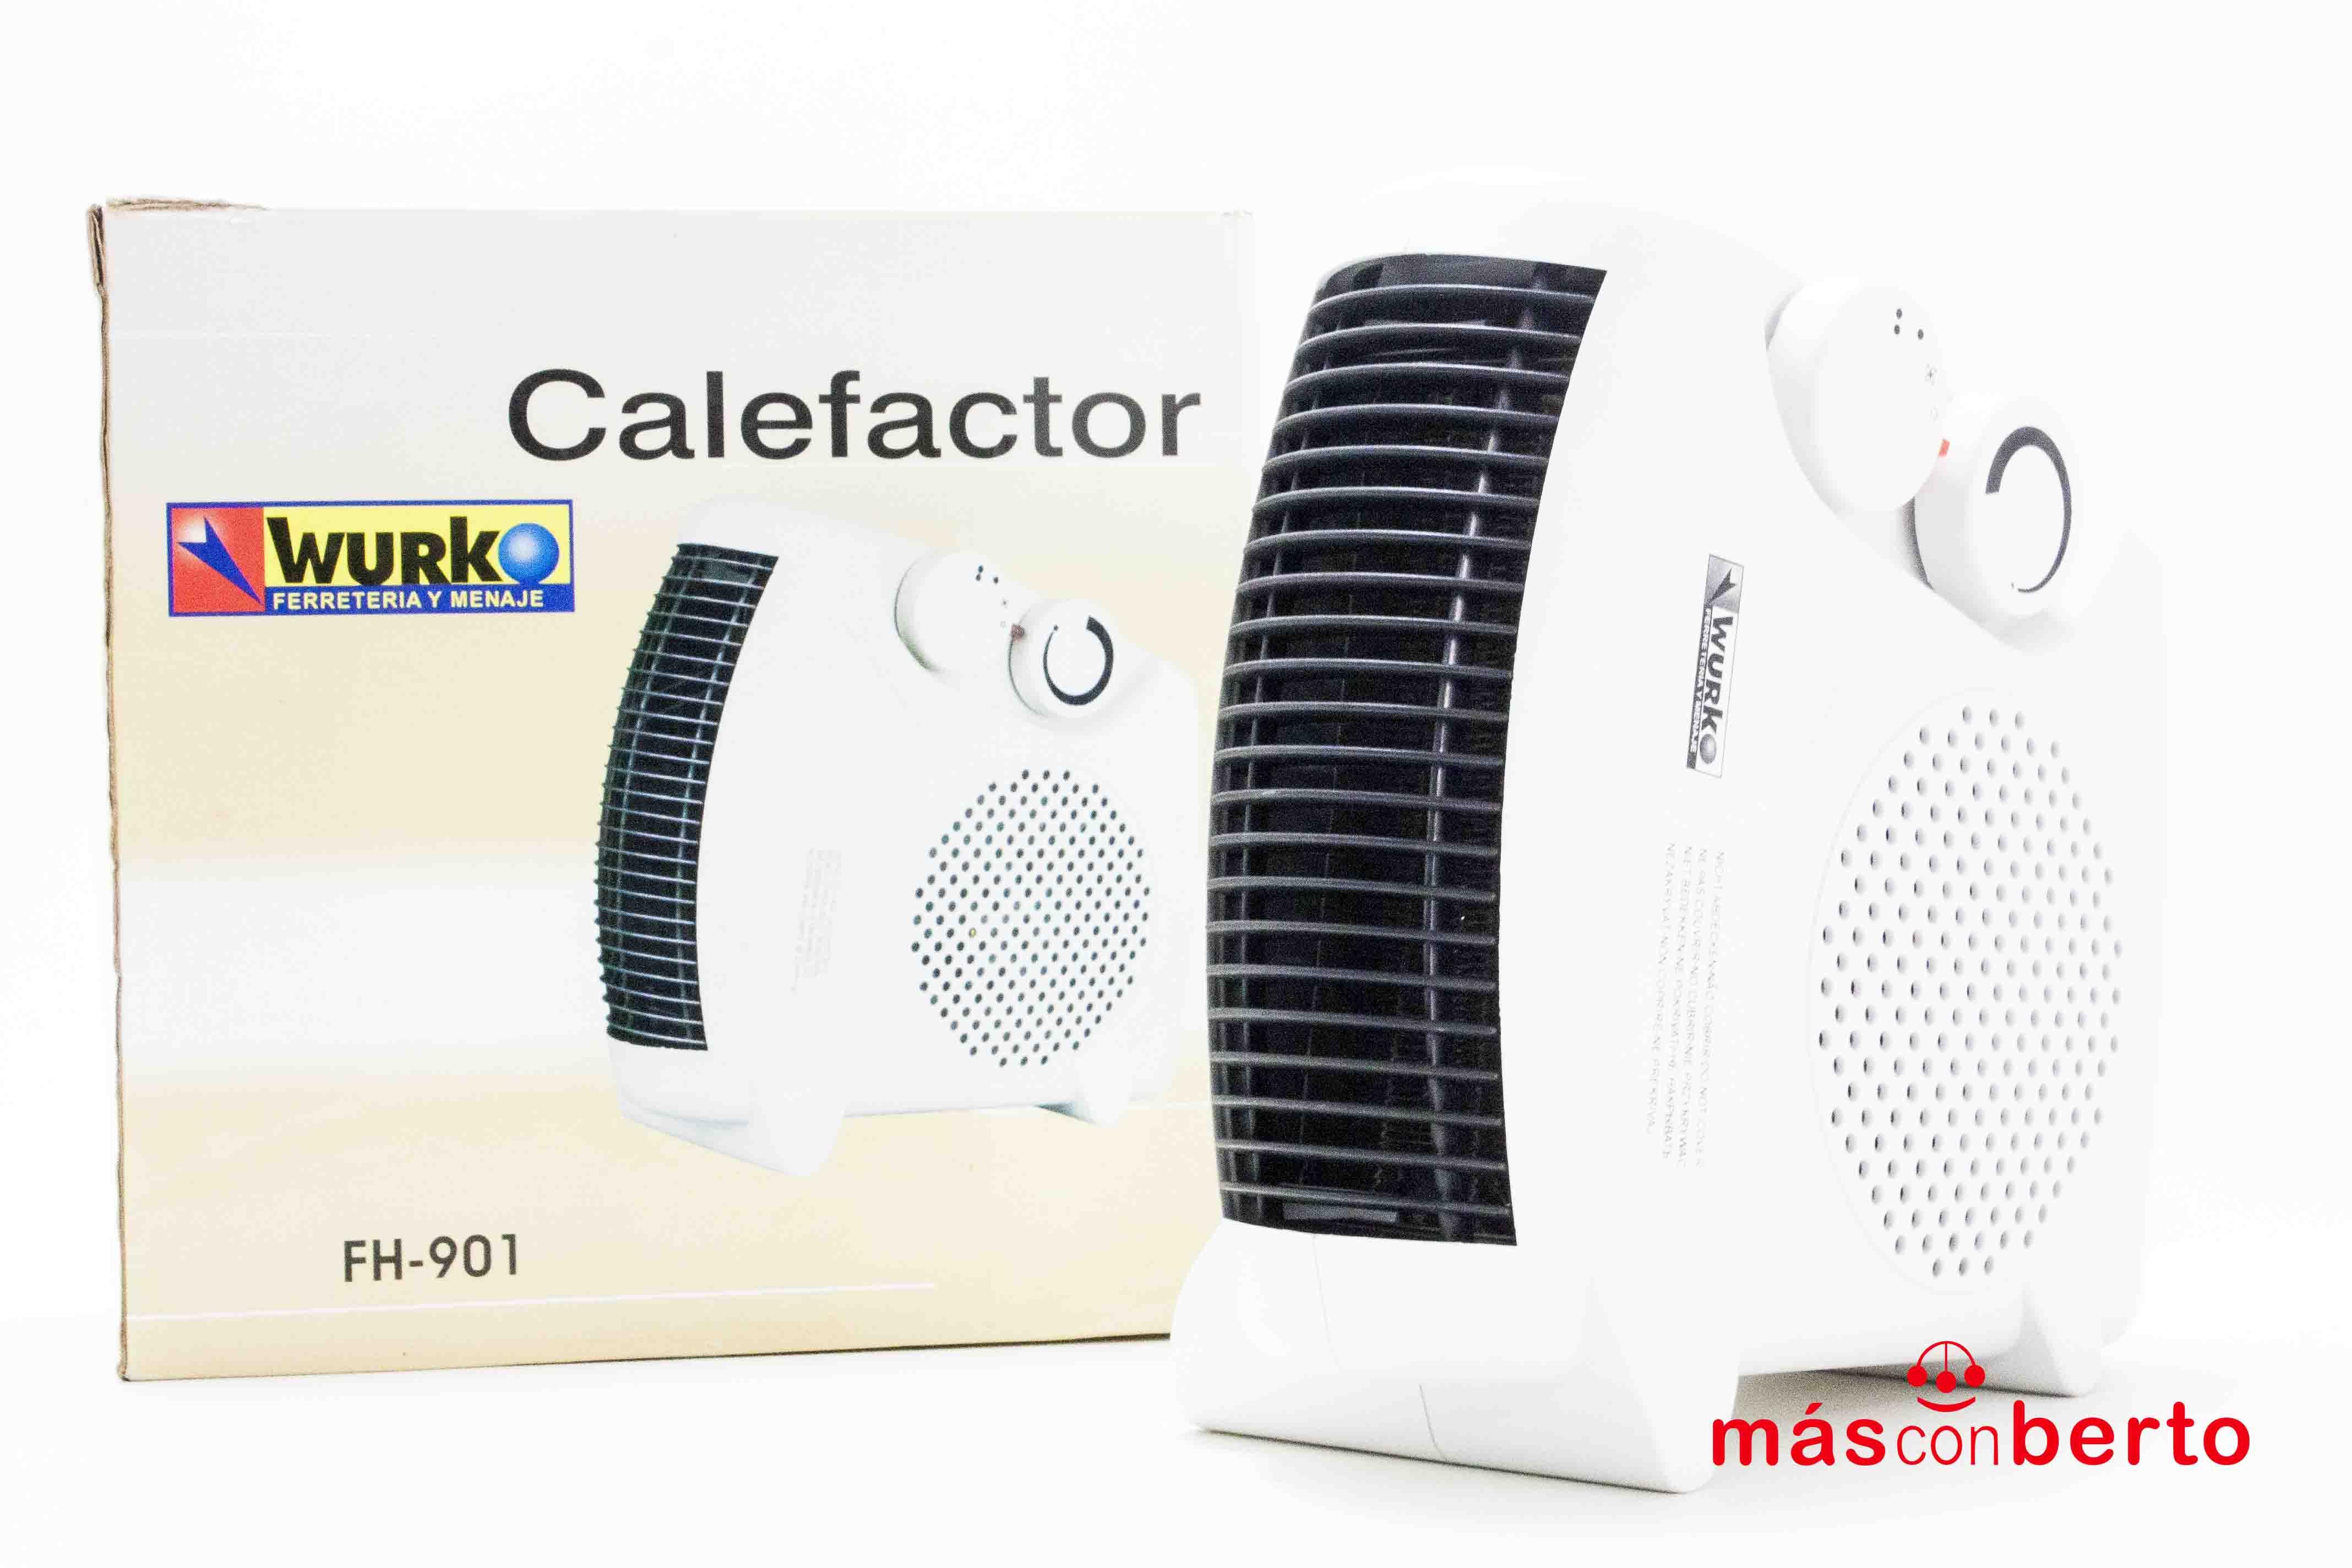 Calefactor Wurko FH-901 2000W